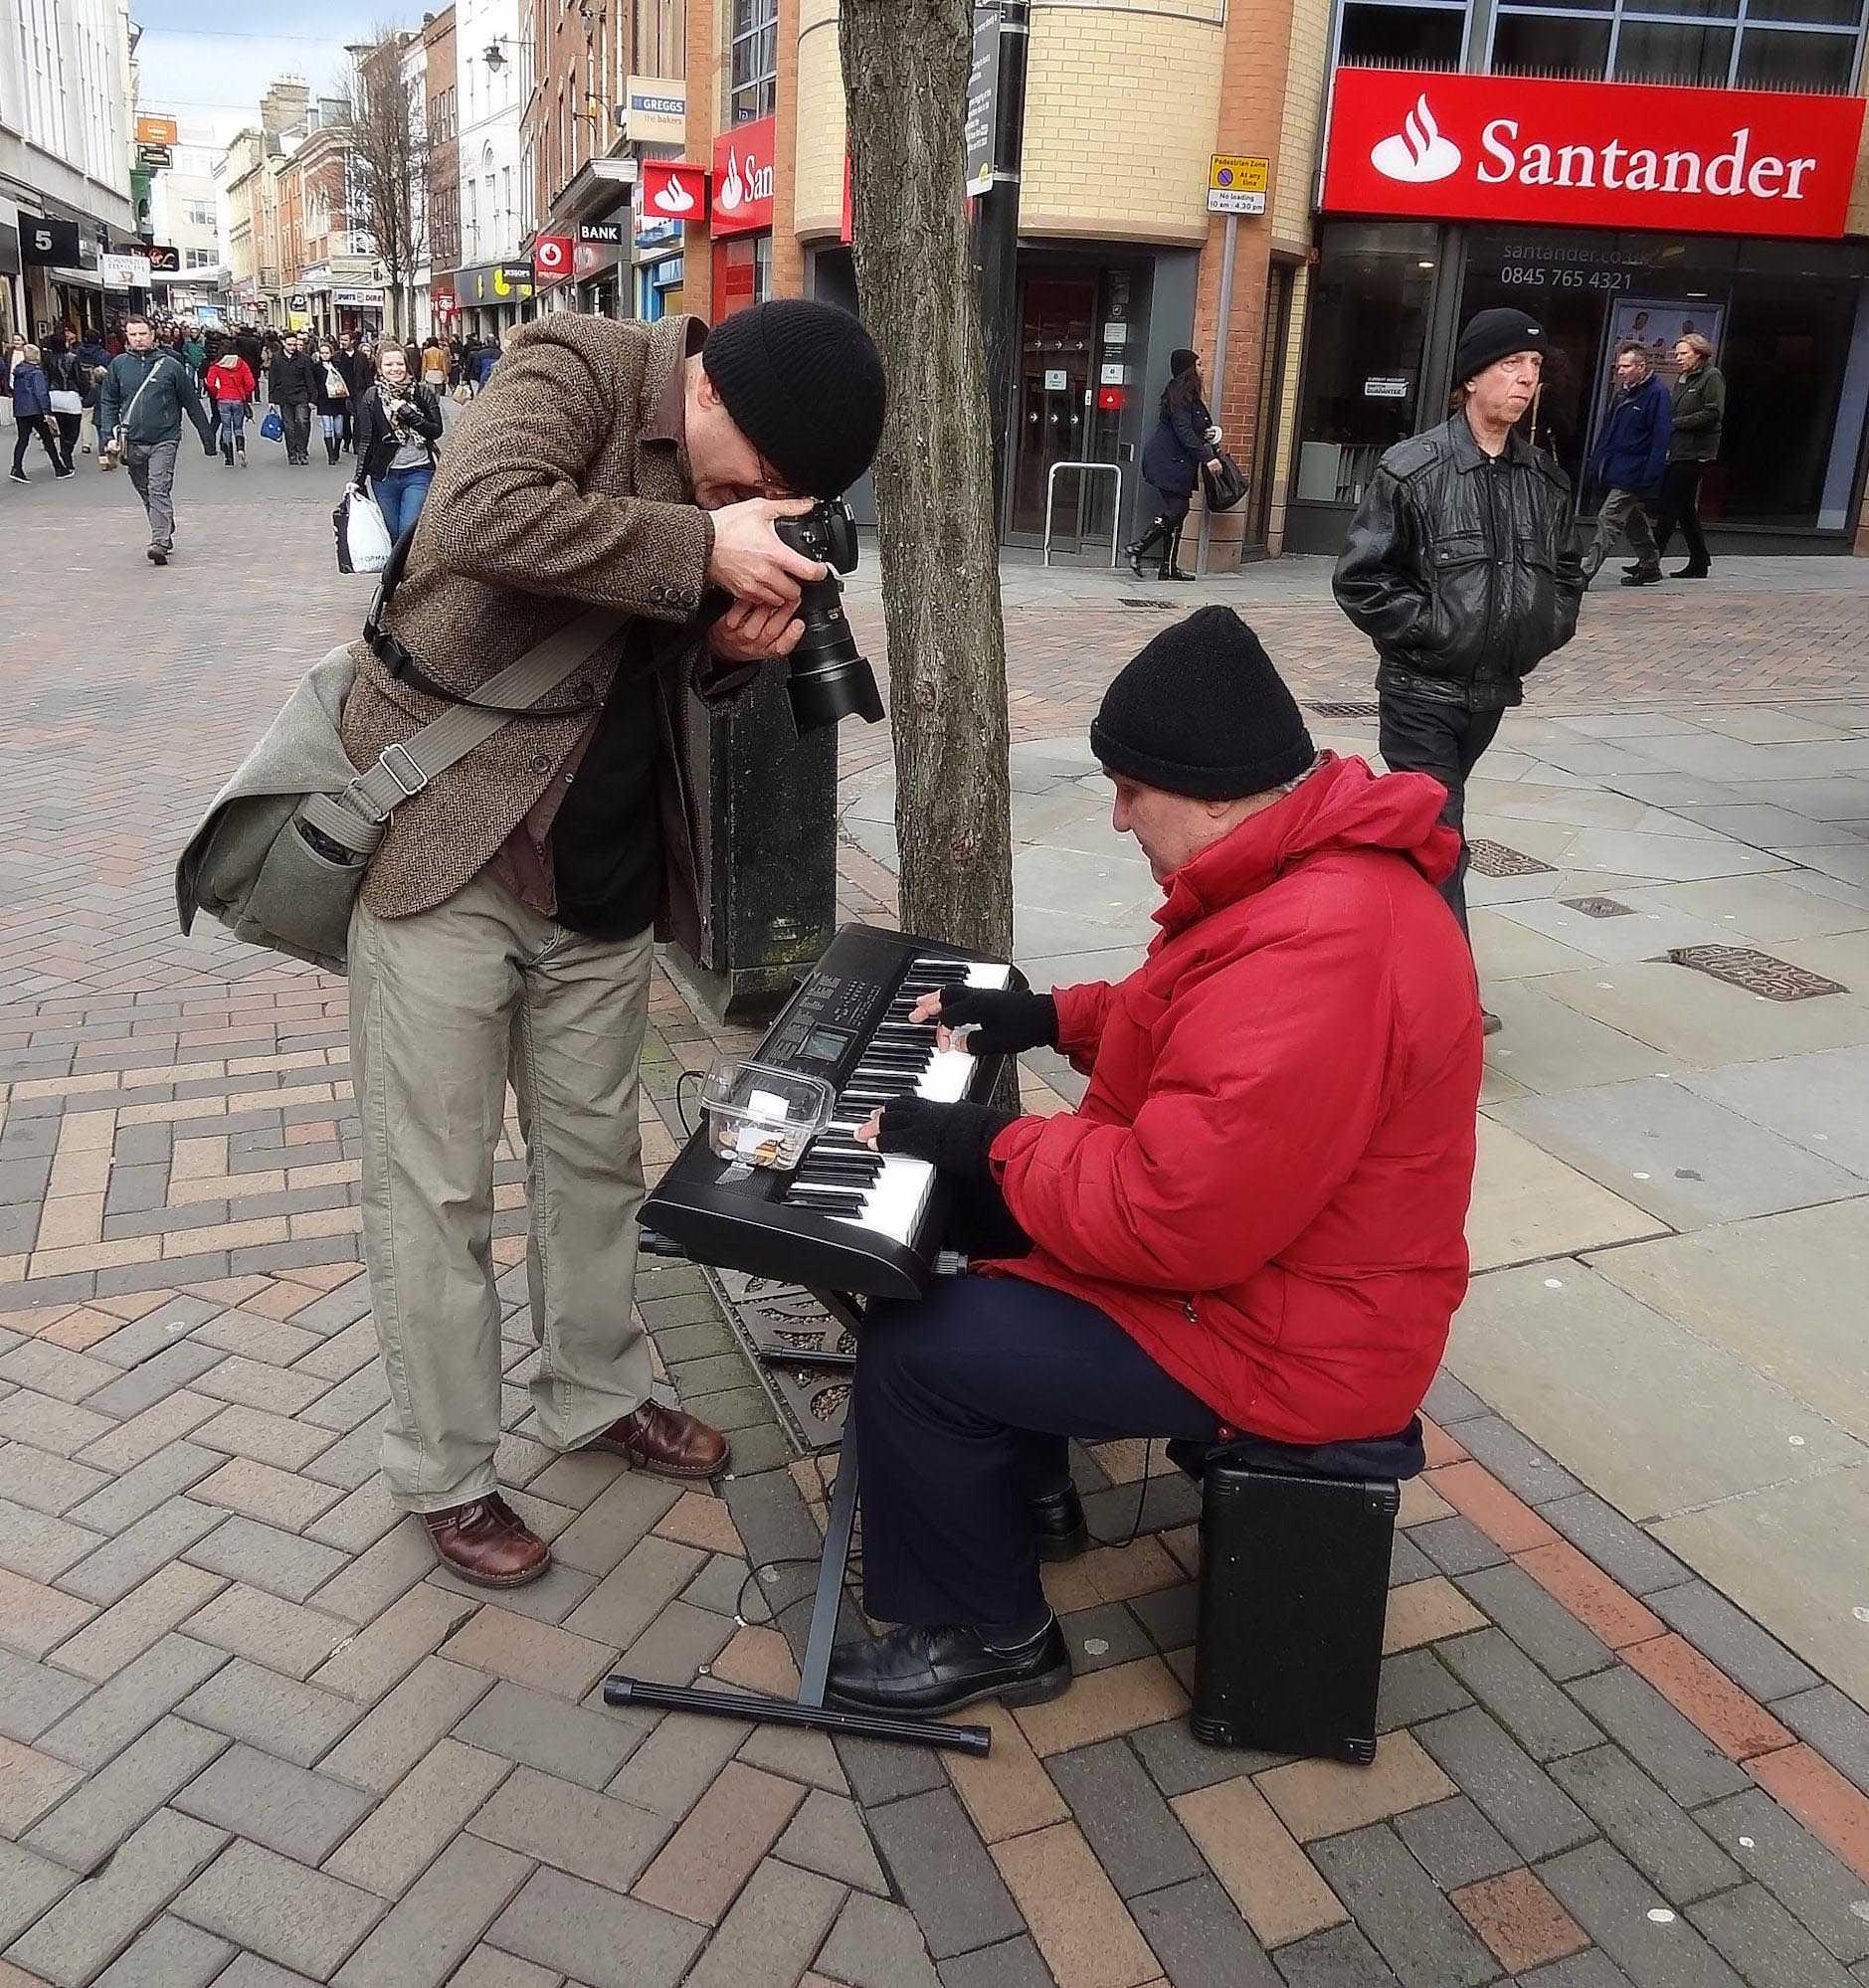 Nottingham, Feb 2014